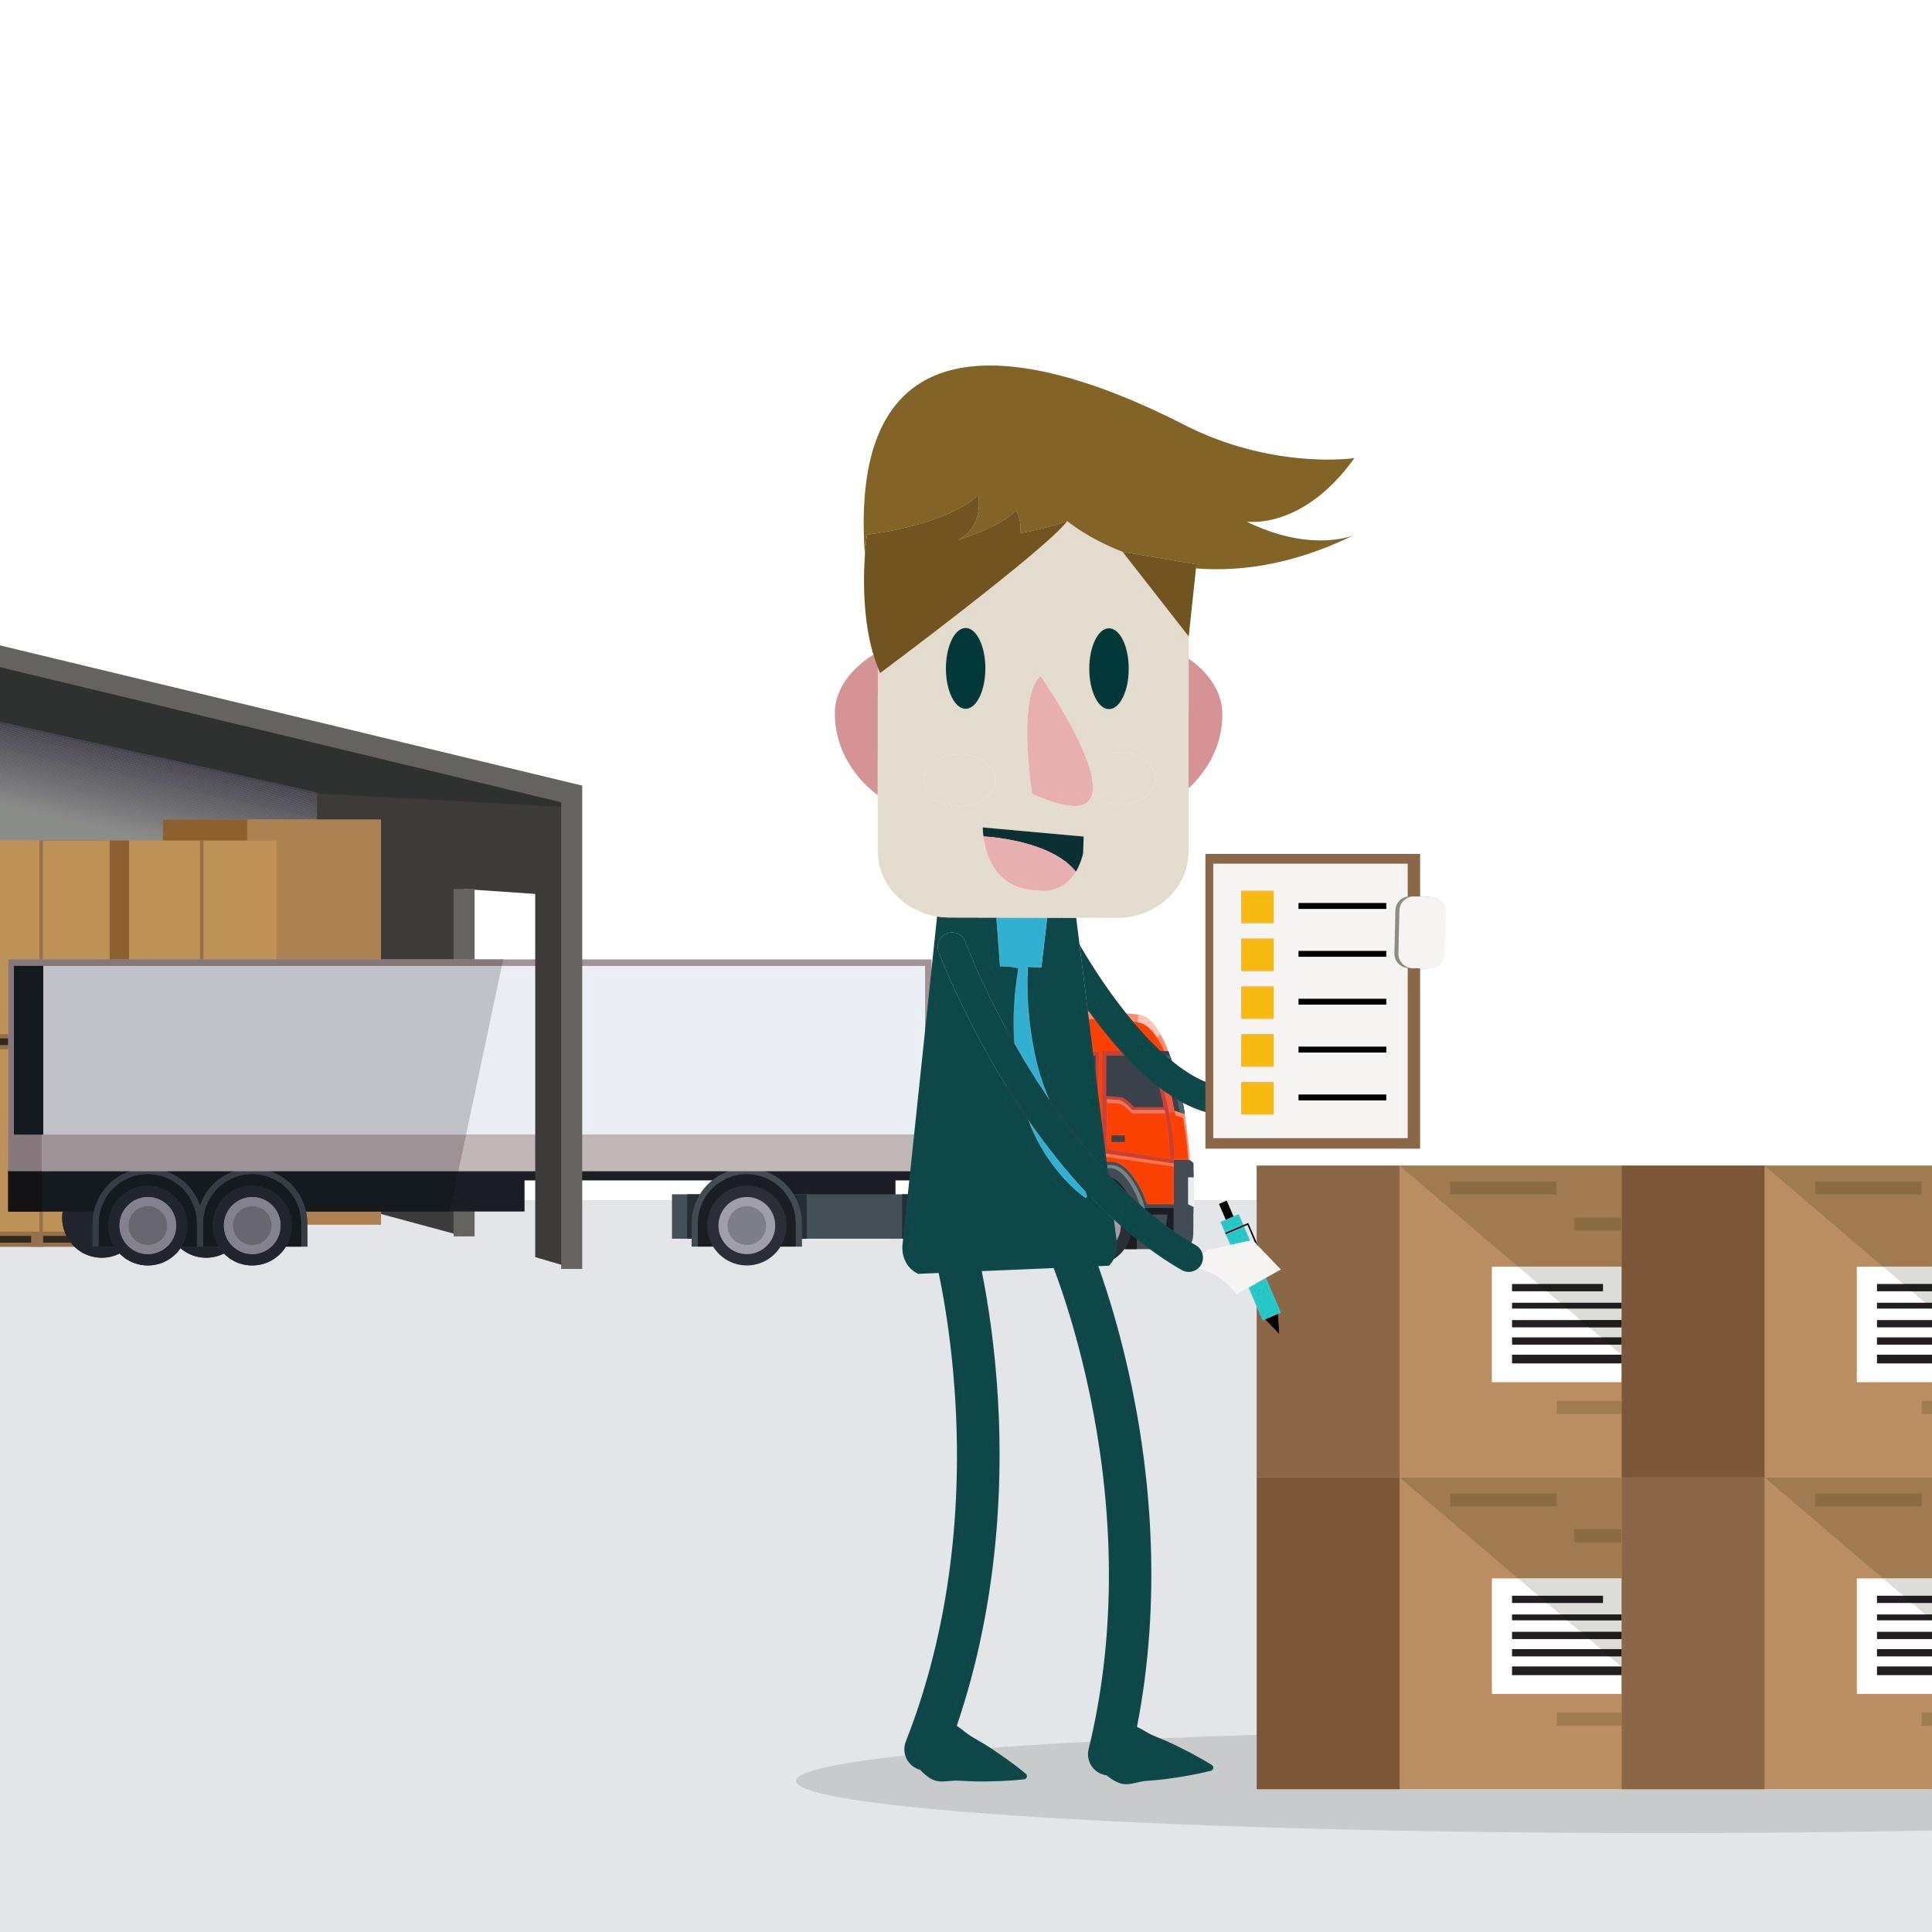 guy-in-warehouse-illustration